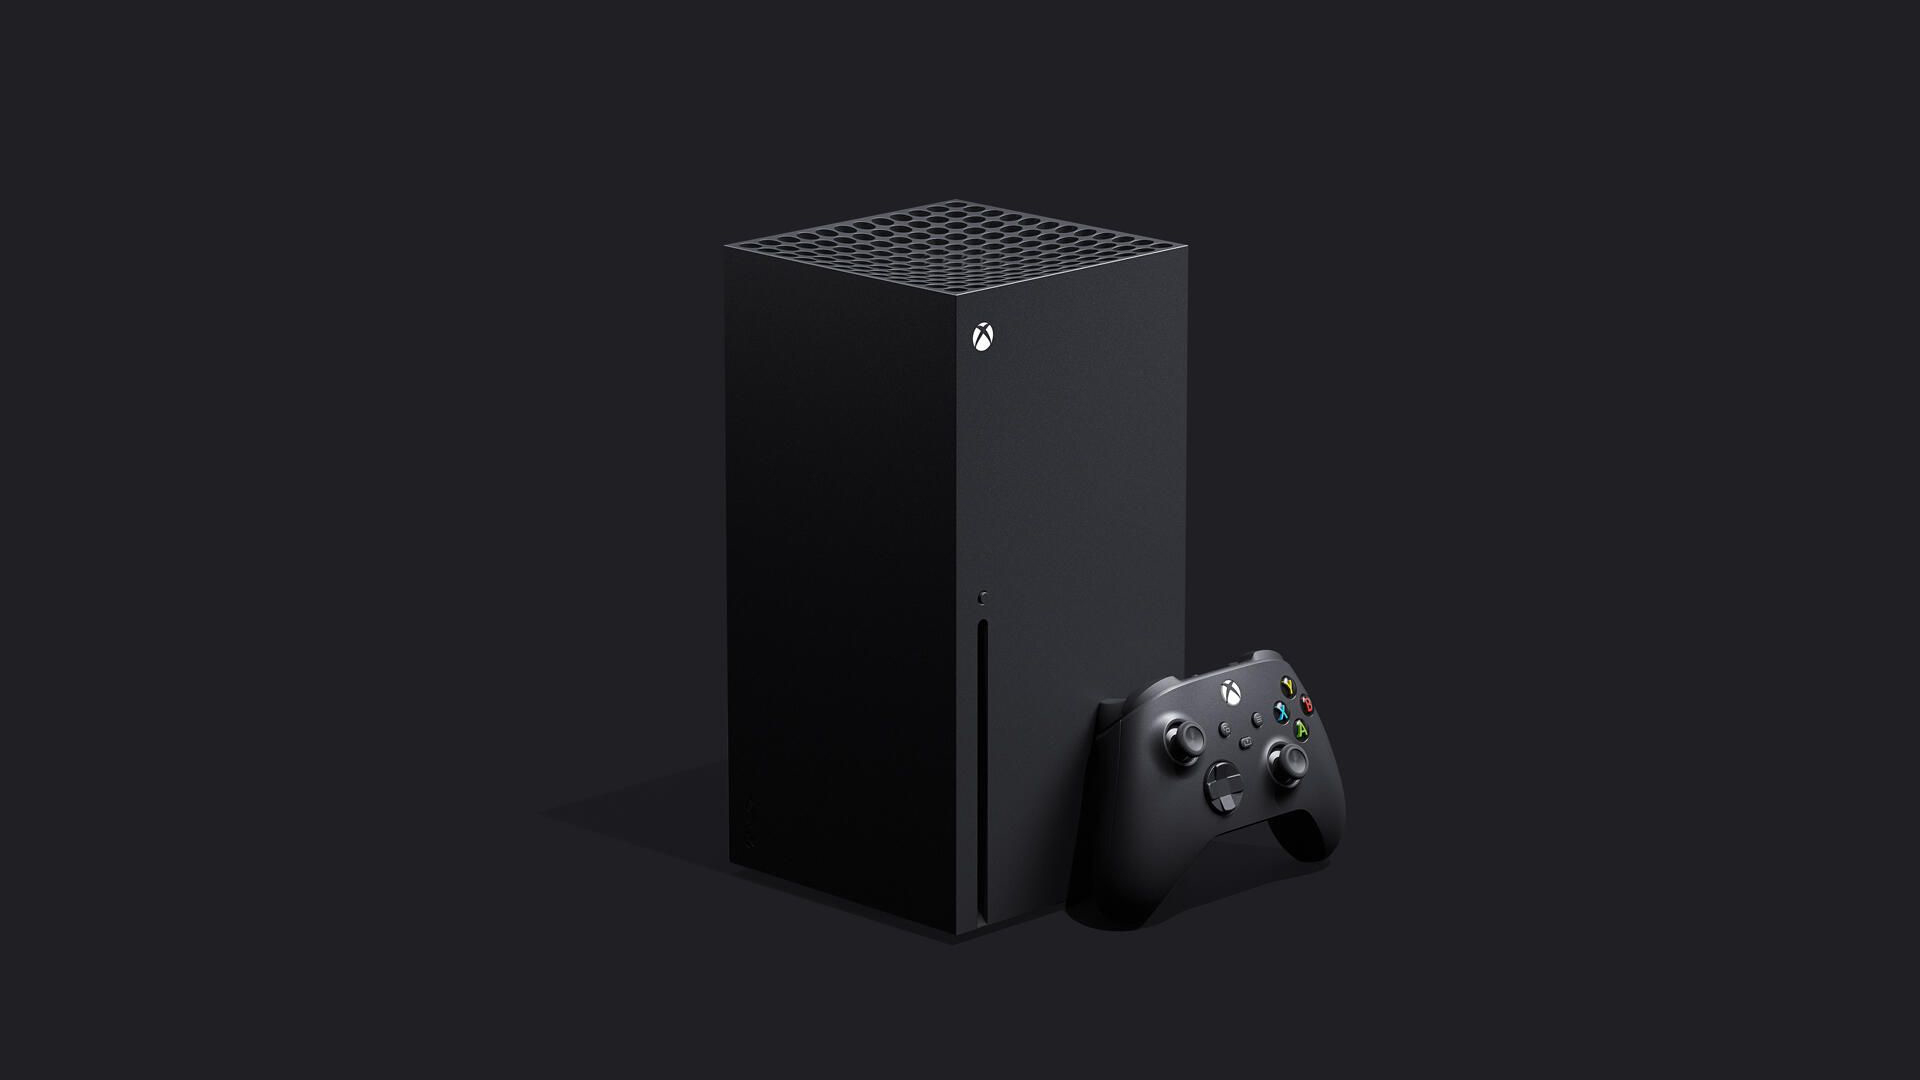 Новости недели: Xbox Series X,Mac Pro, Redmi K30,Galaxy S11, State of Play, трейлеры